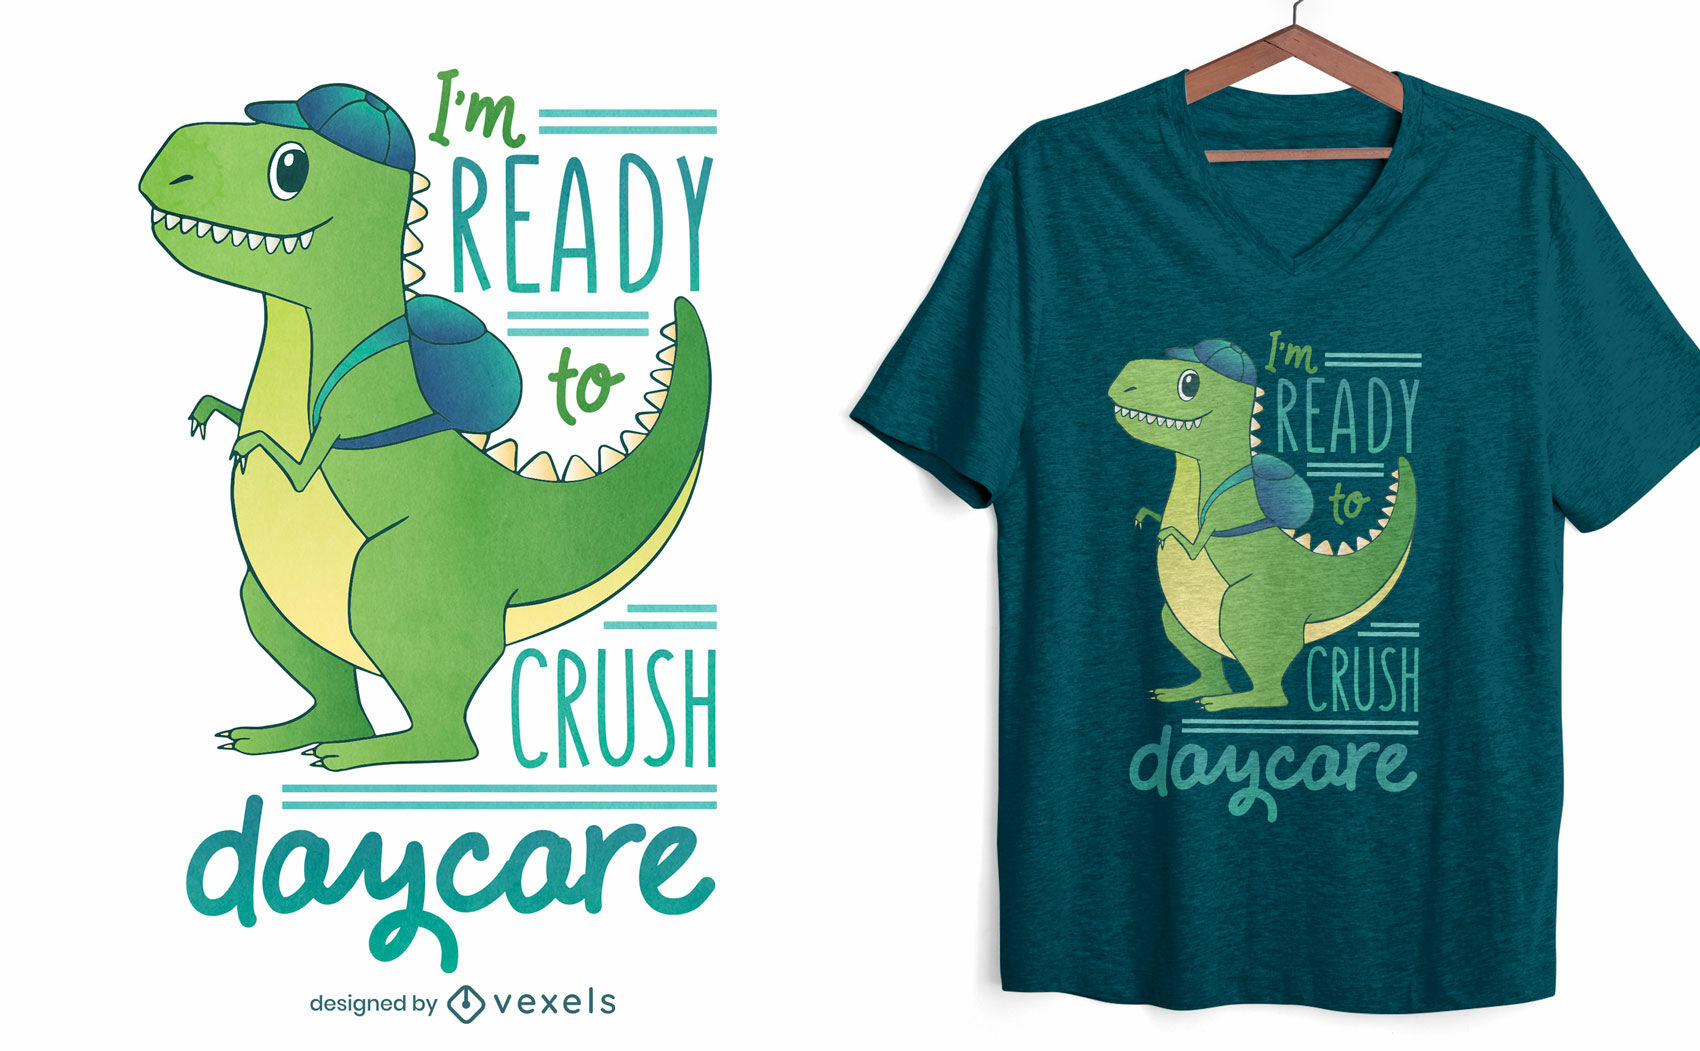 Daycare t-rex t-shirt design